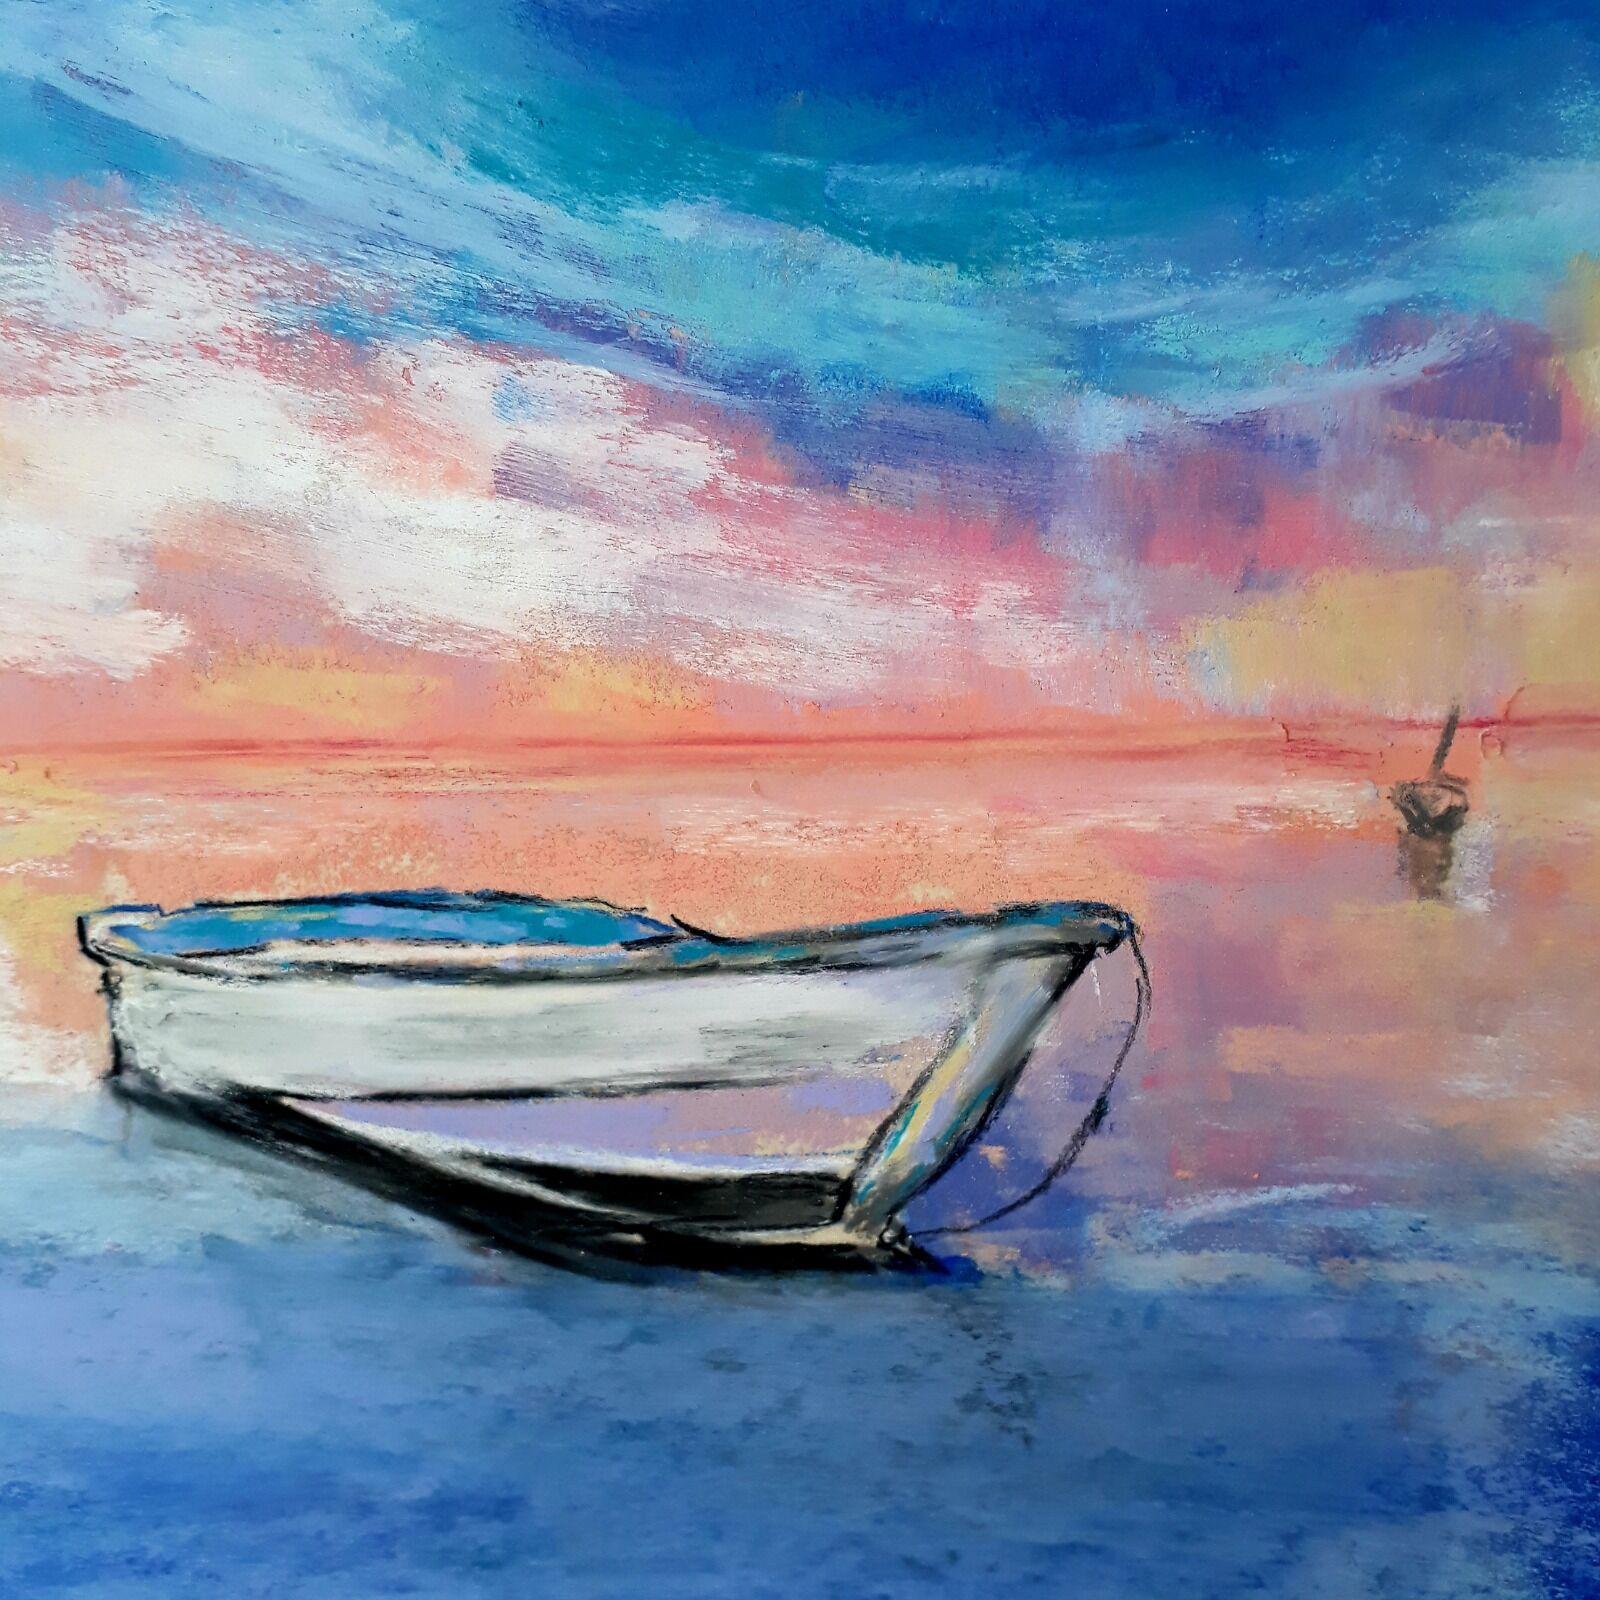 Blue boat, blue sea